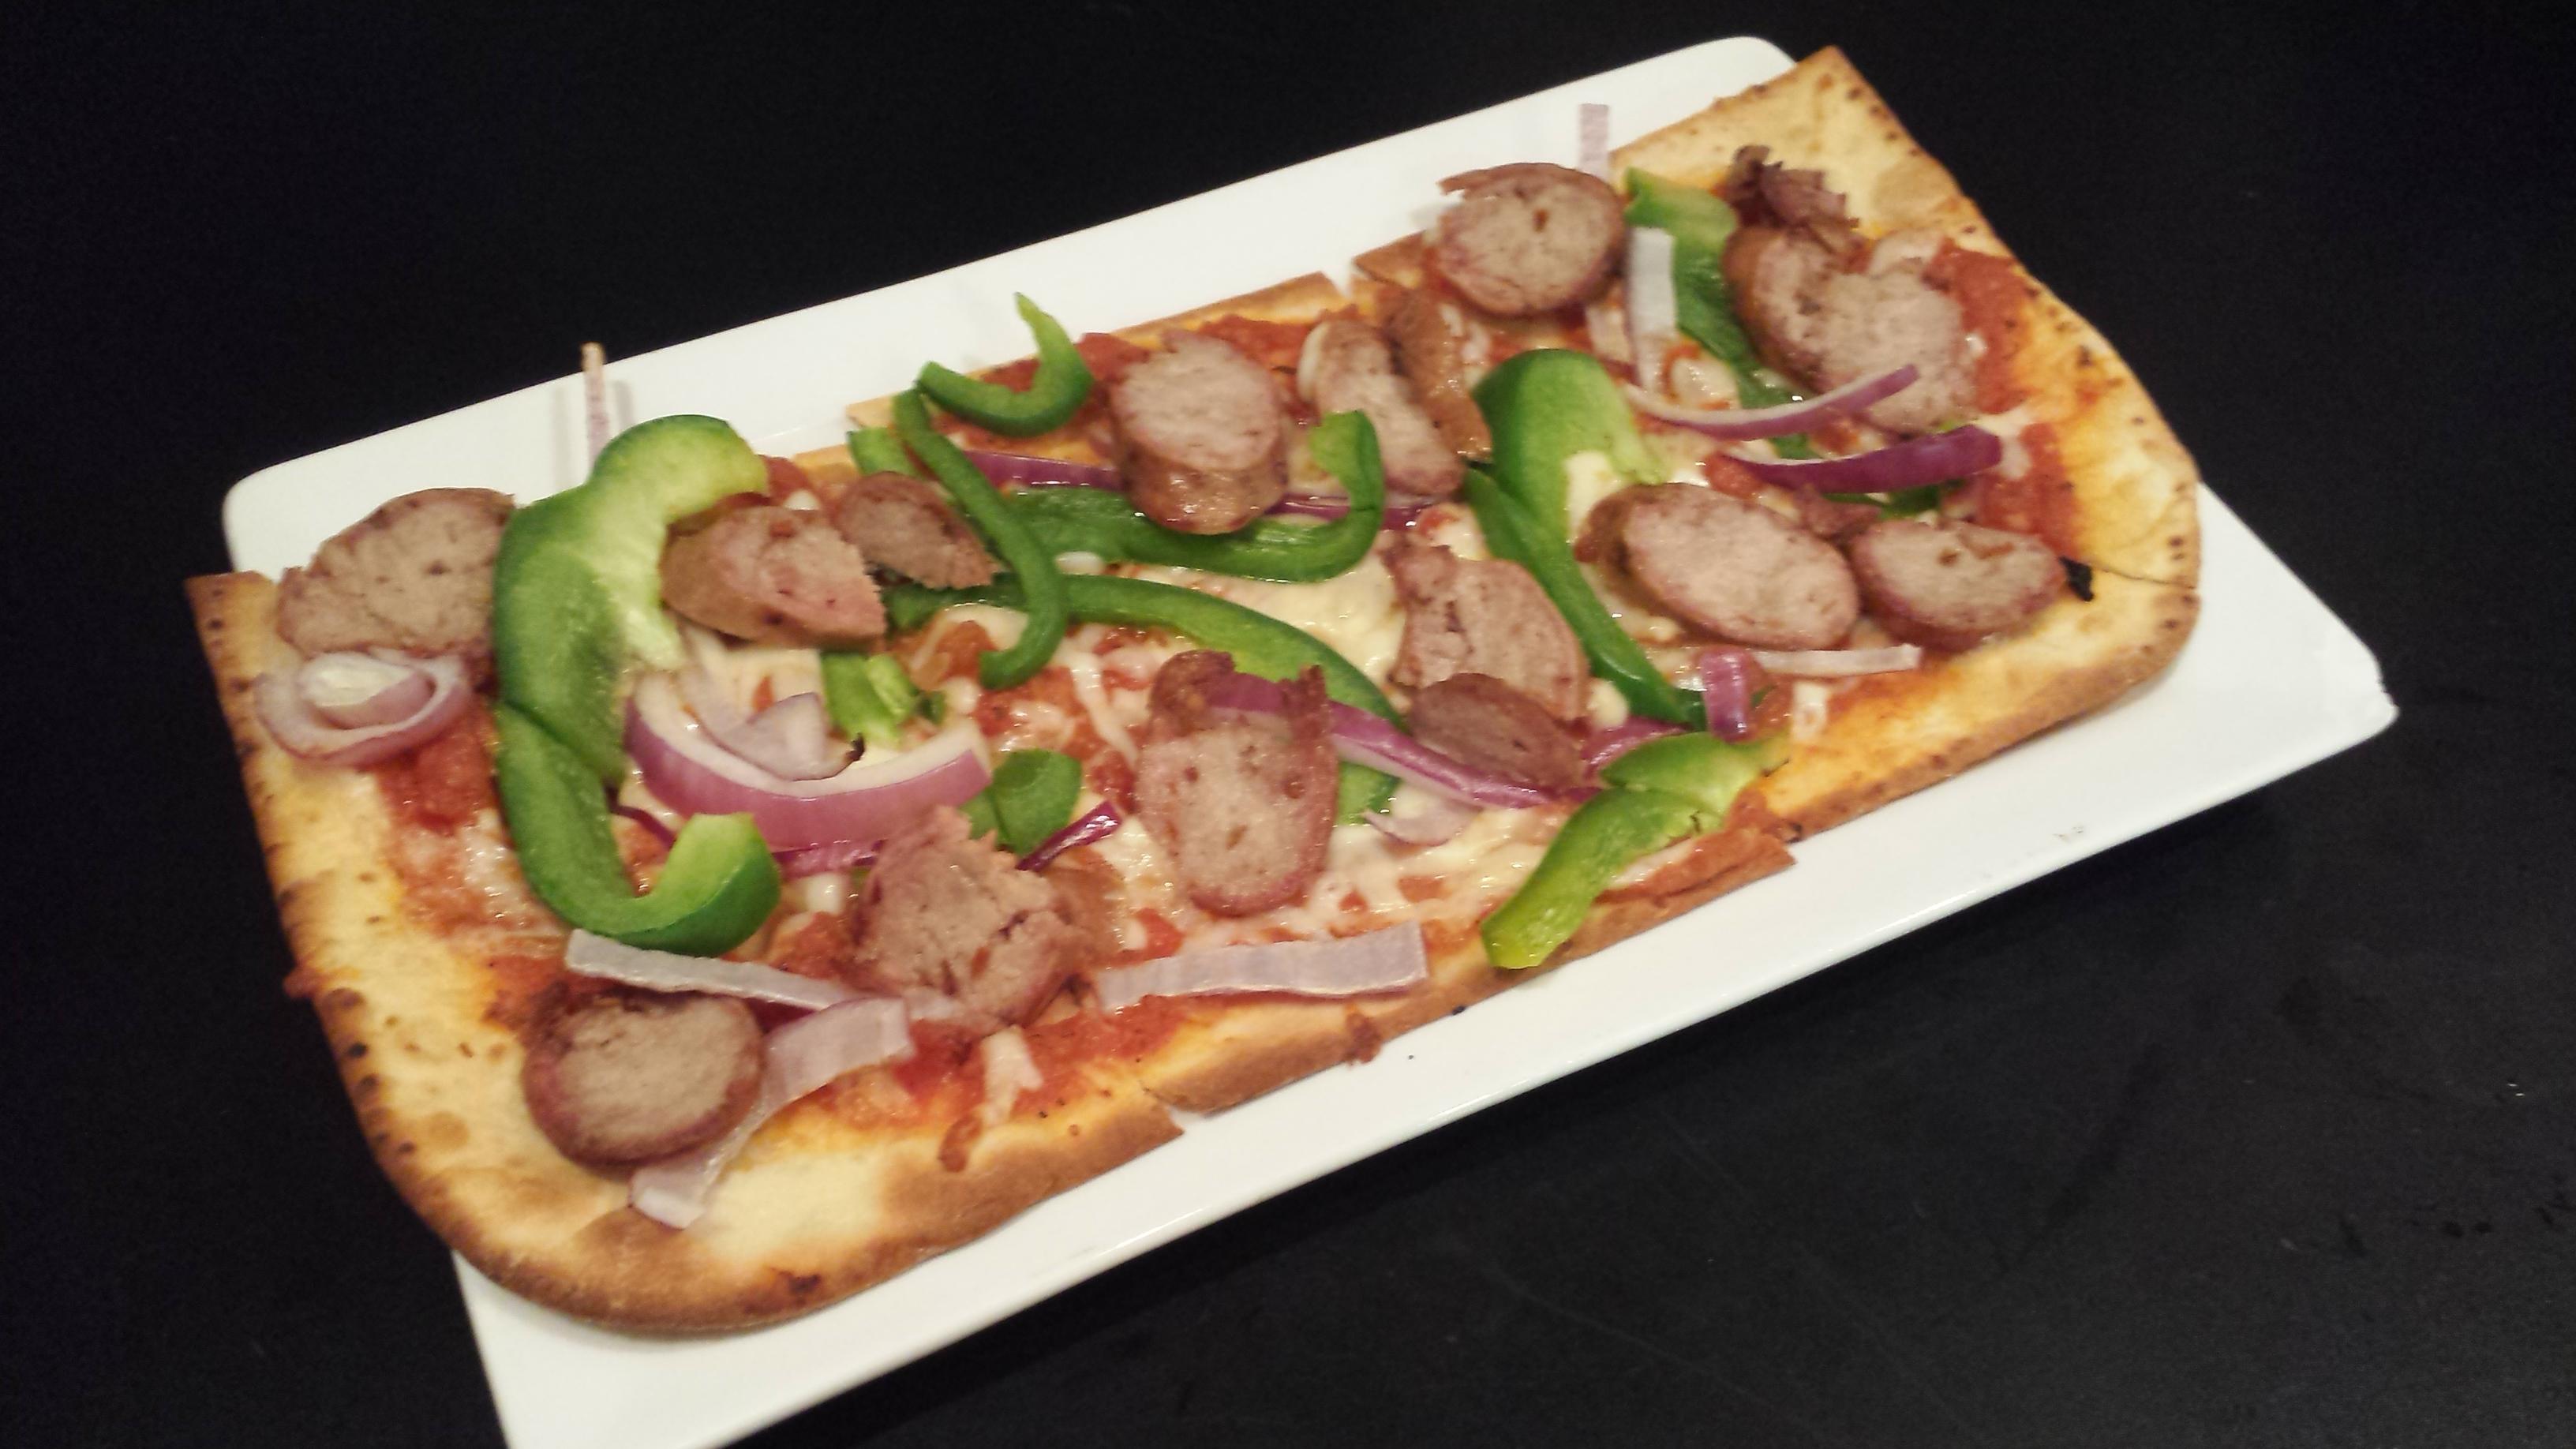 House Smoked Sausage Pizza - $9